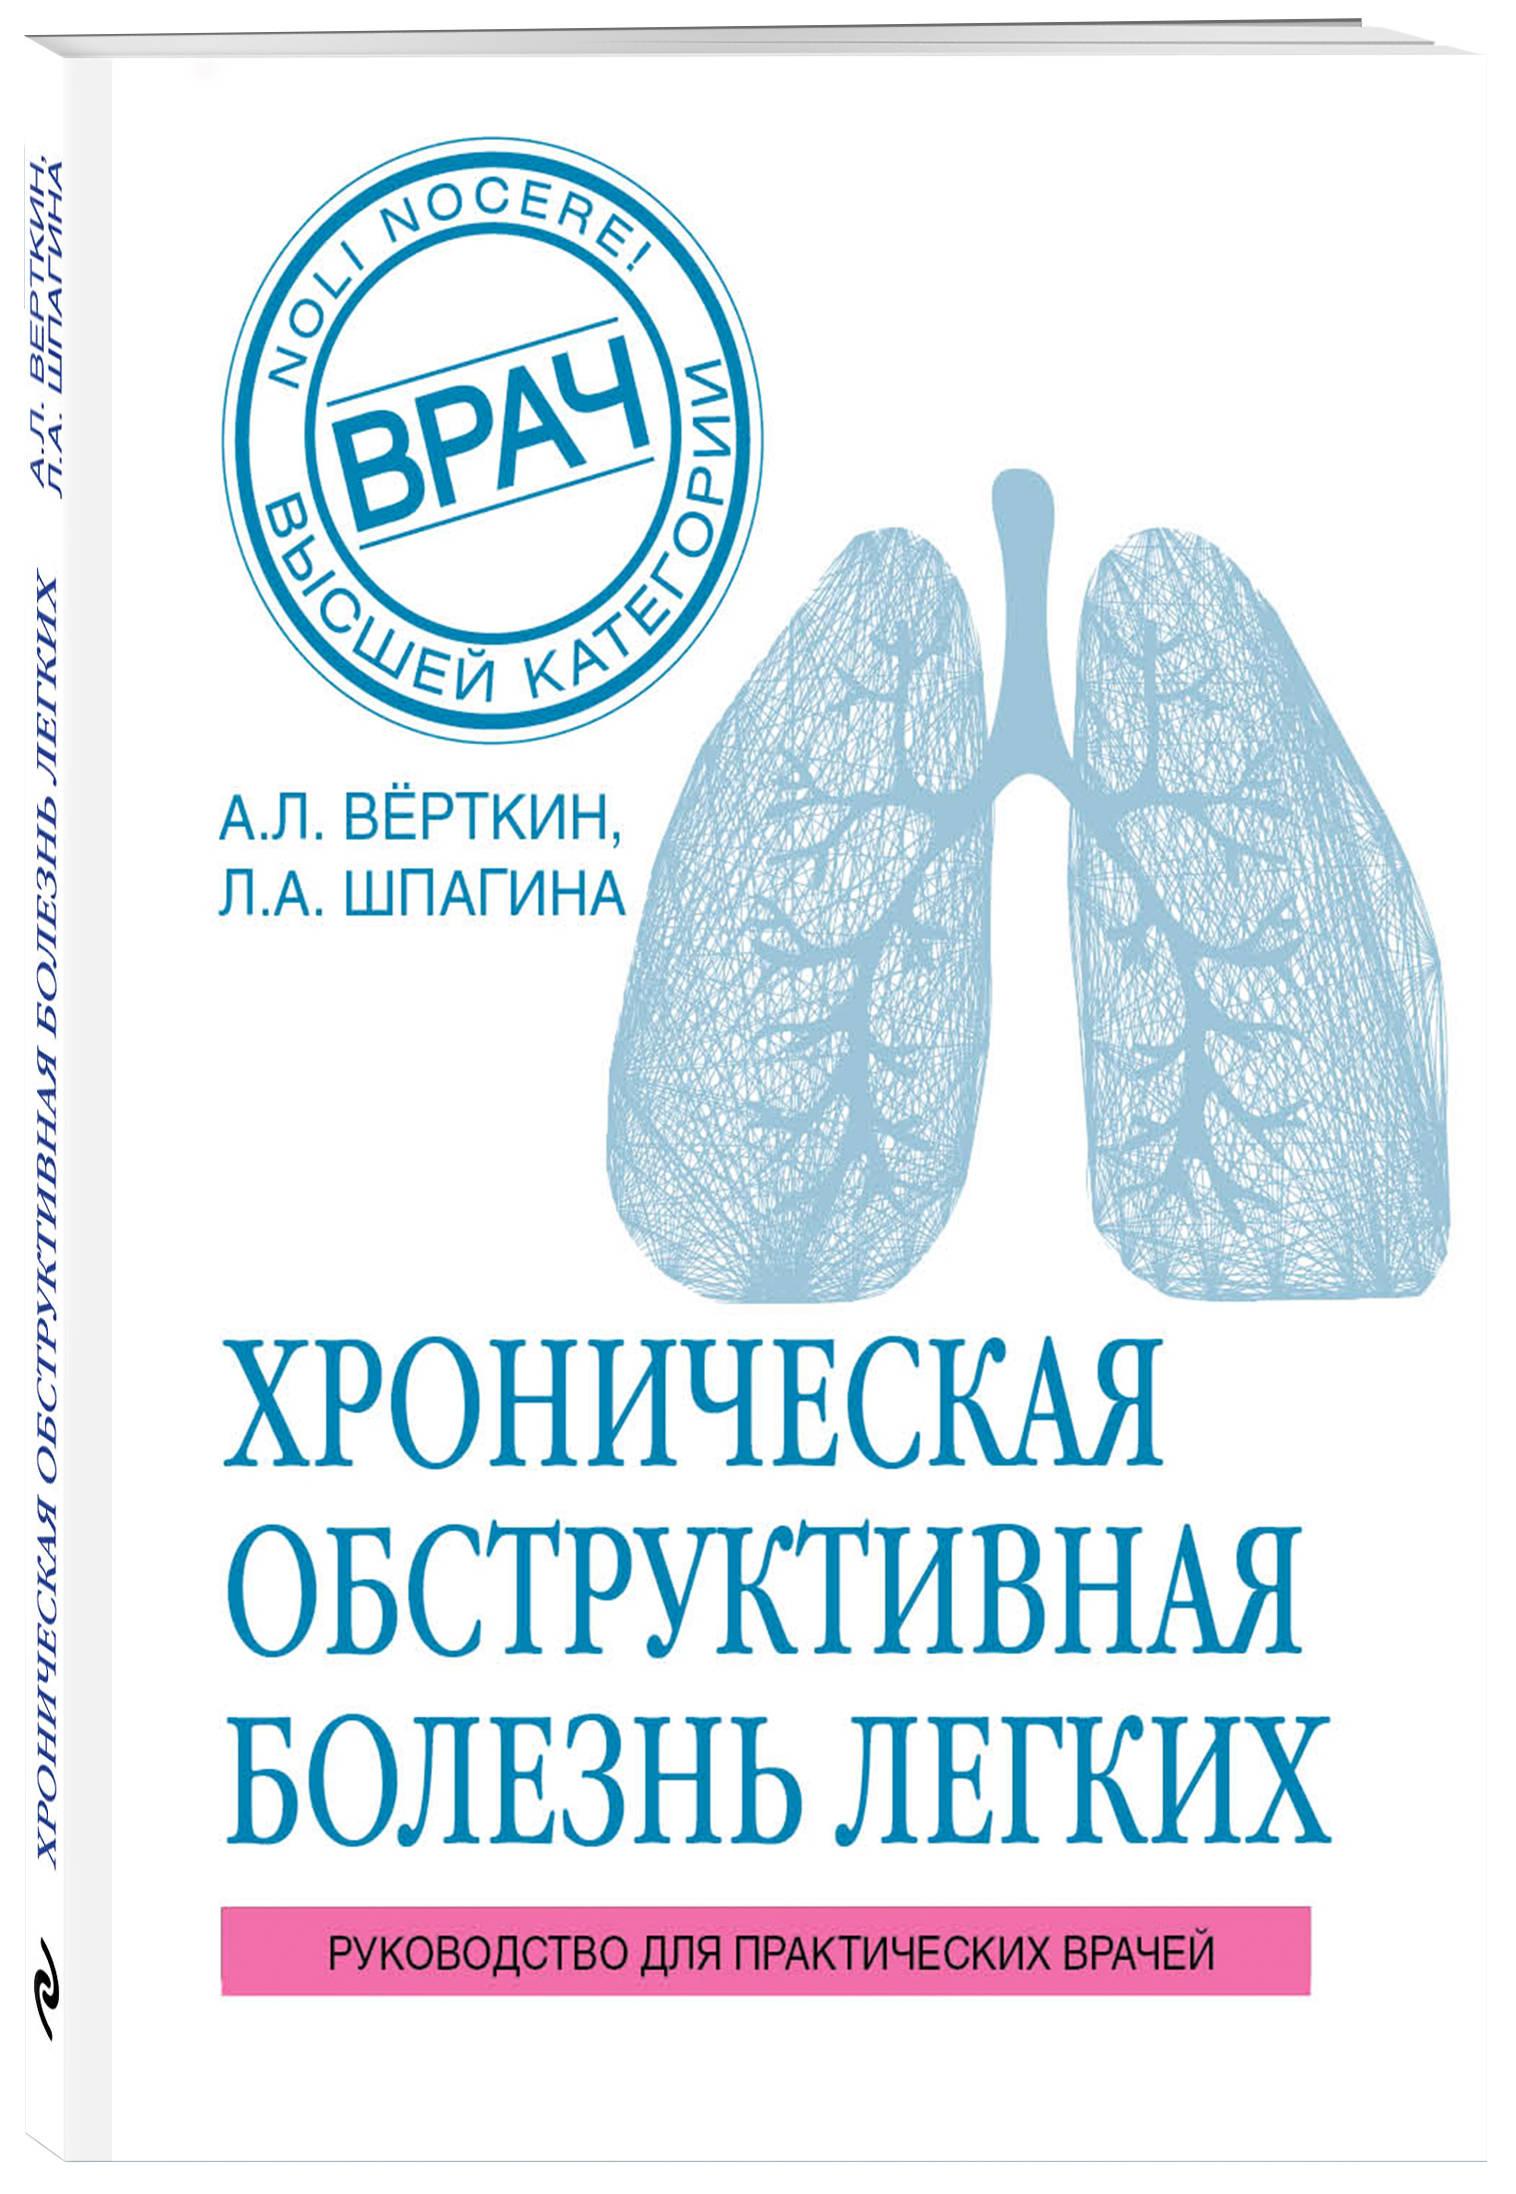 9785040927289 - Вёрткин А.Л., Шпагина Л.А.: ХОБЛ. Руководство для практических врачей - Книга